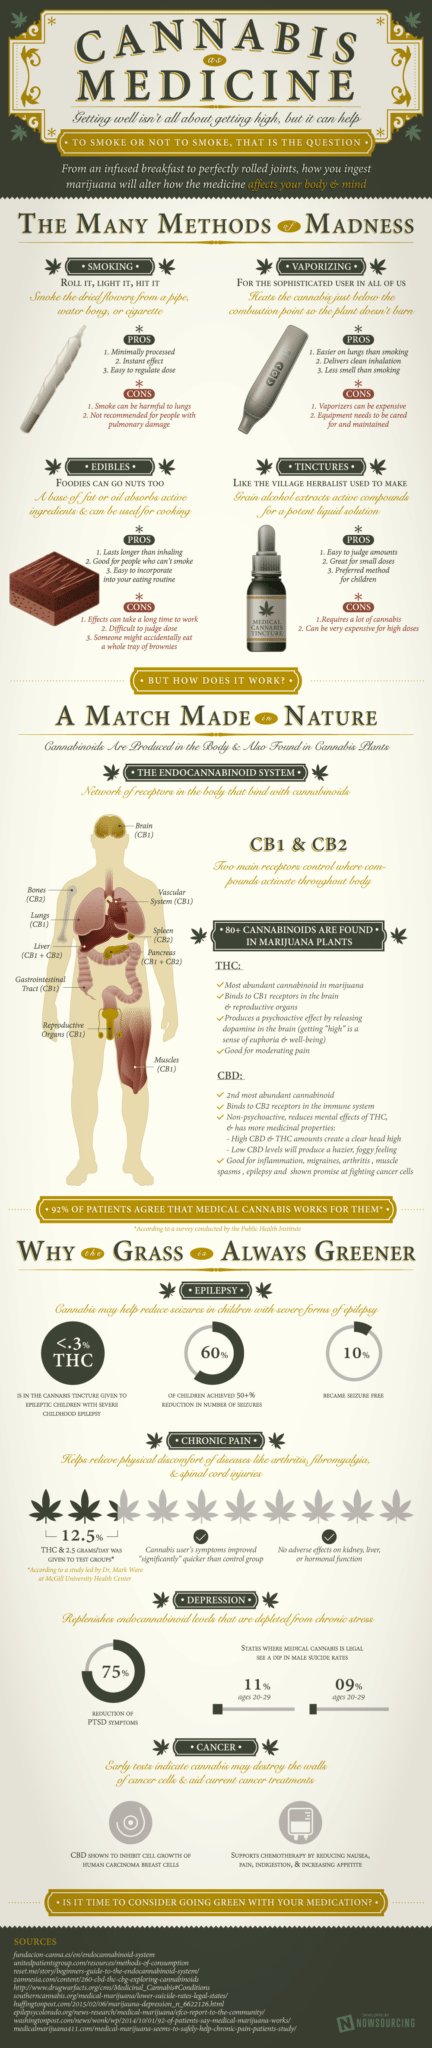 Cannabis-Medicine-Infographic